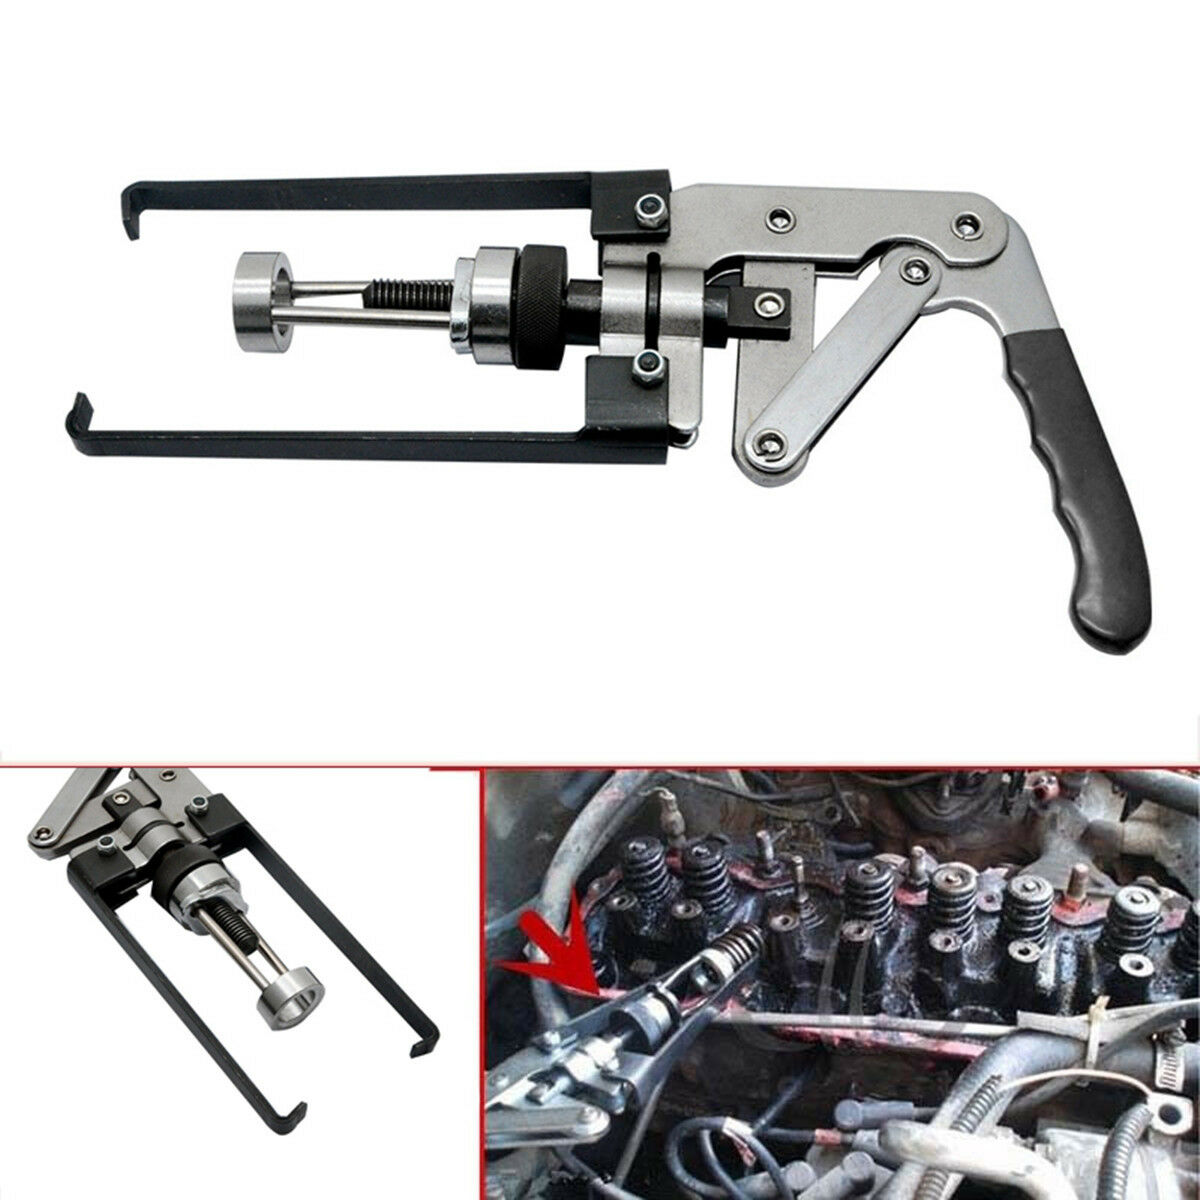 Engine Overhead Cam Valve Spring Compressor Removal Tool OHV/OHC/CHV Auto Motors